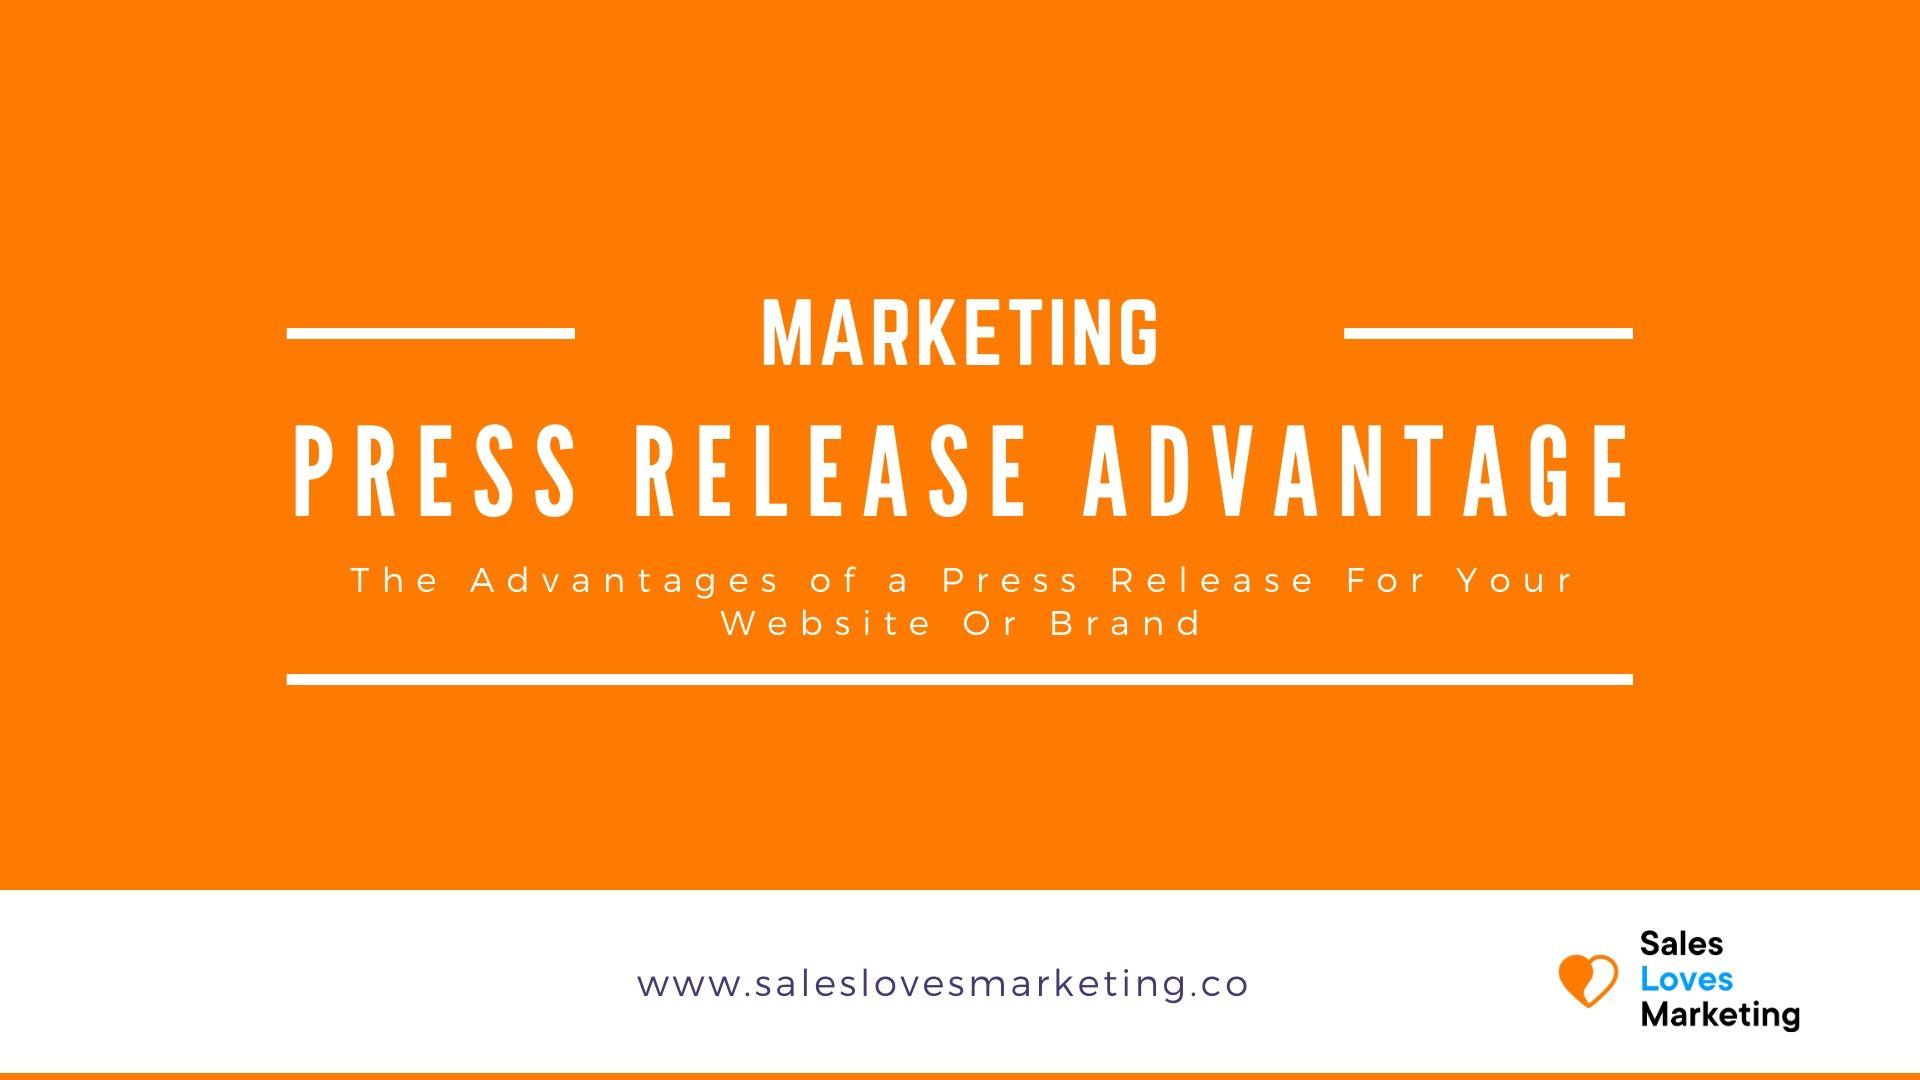 Advantage of press release blog cover